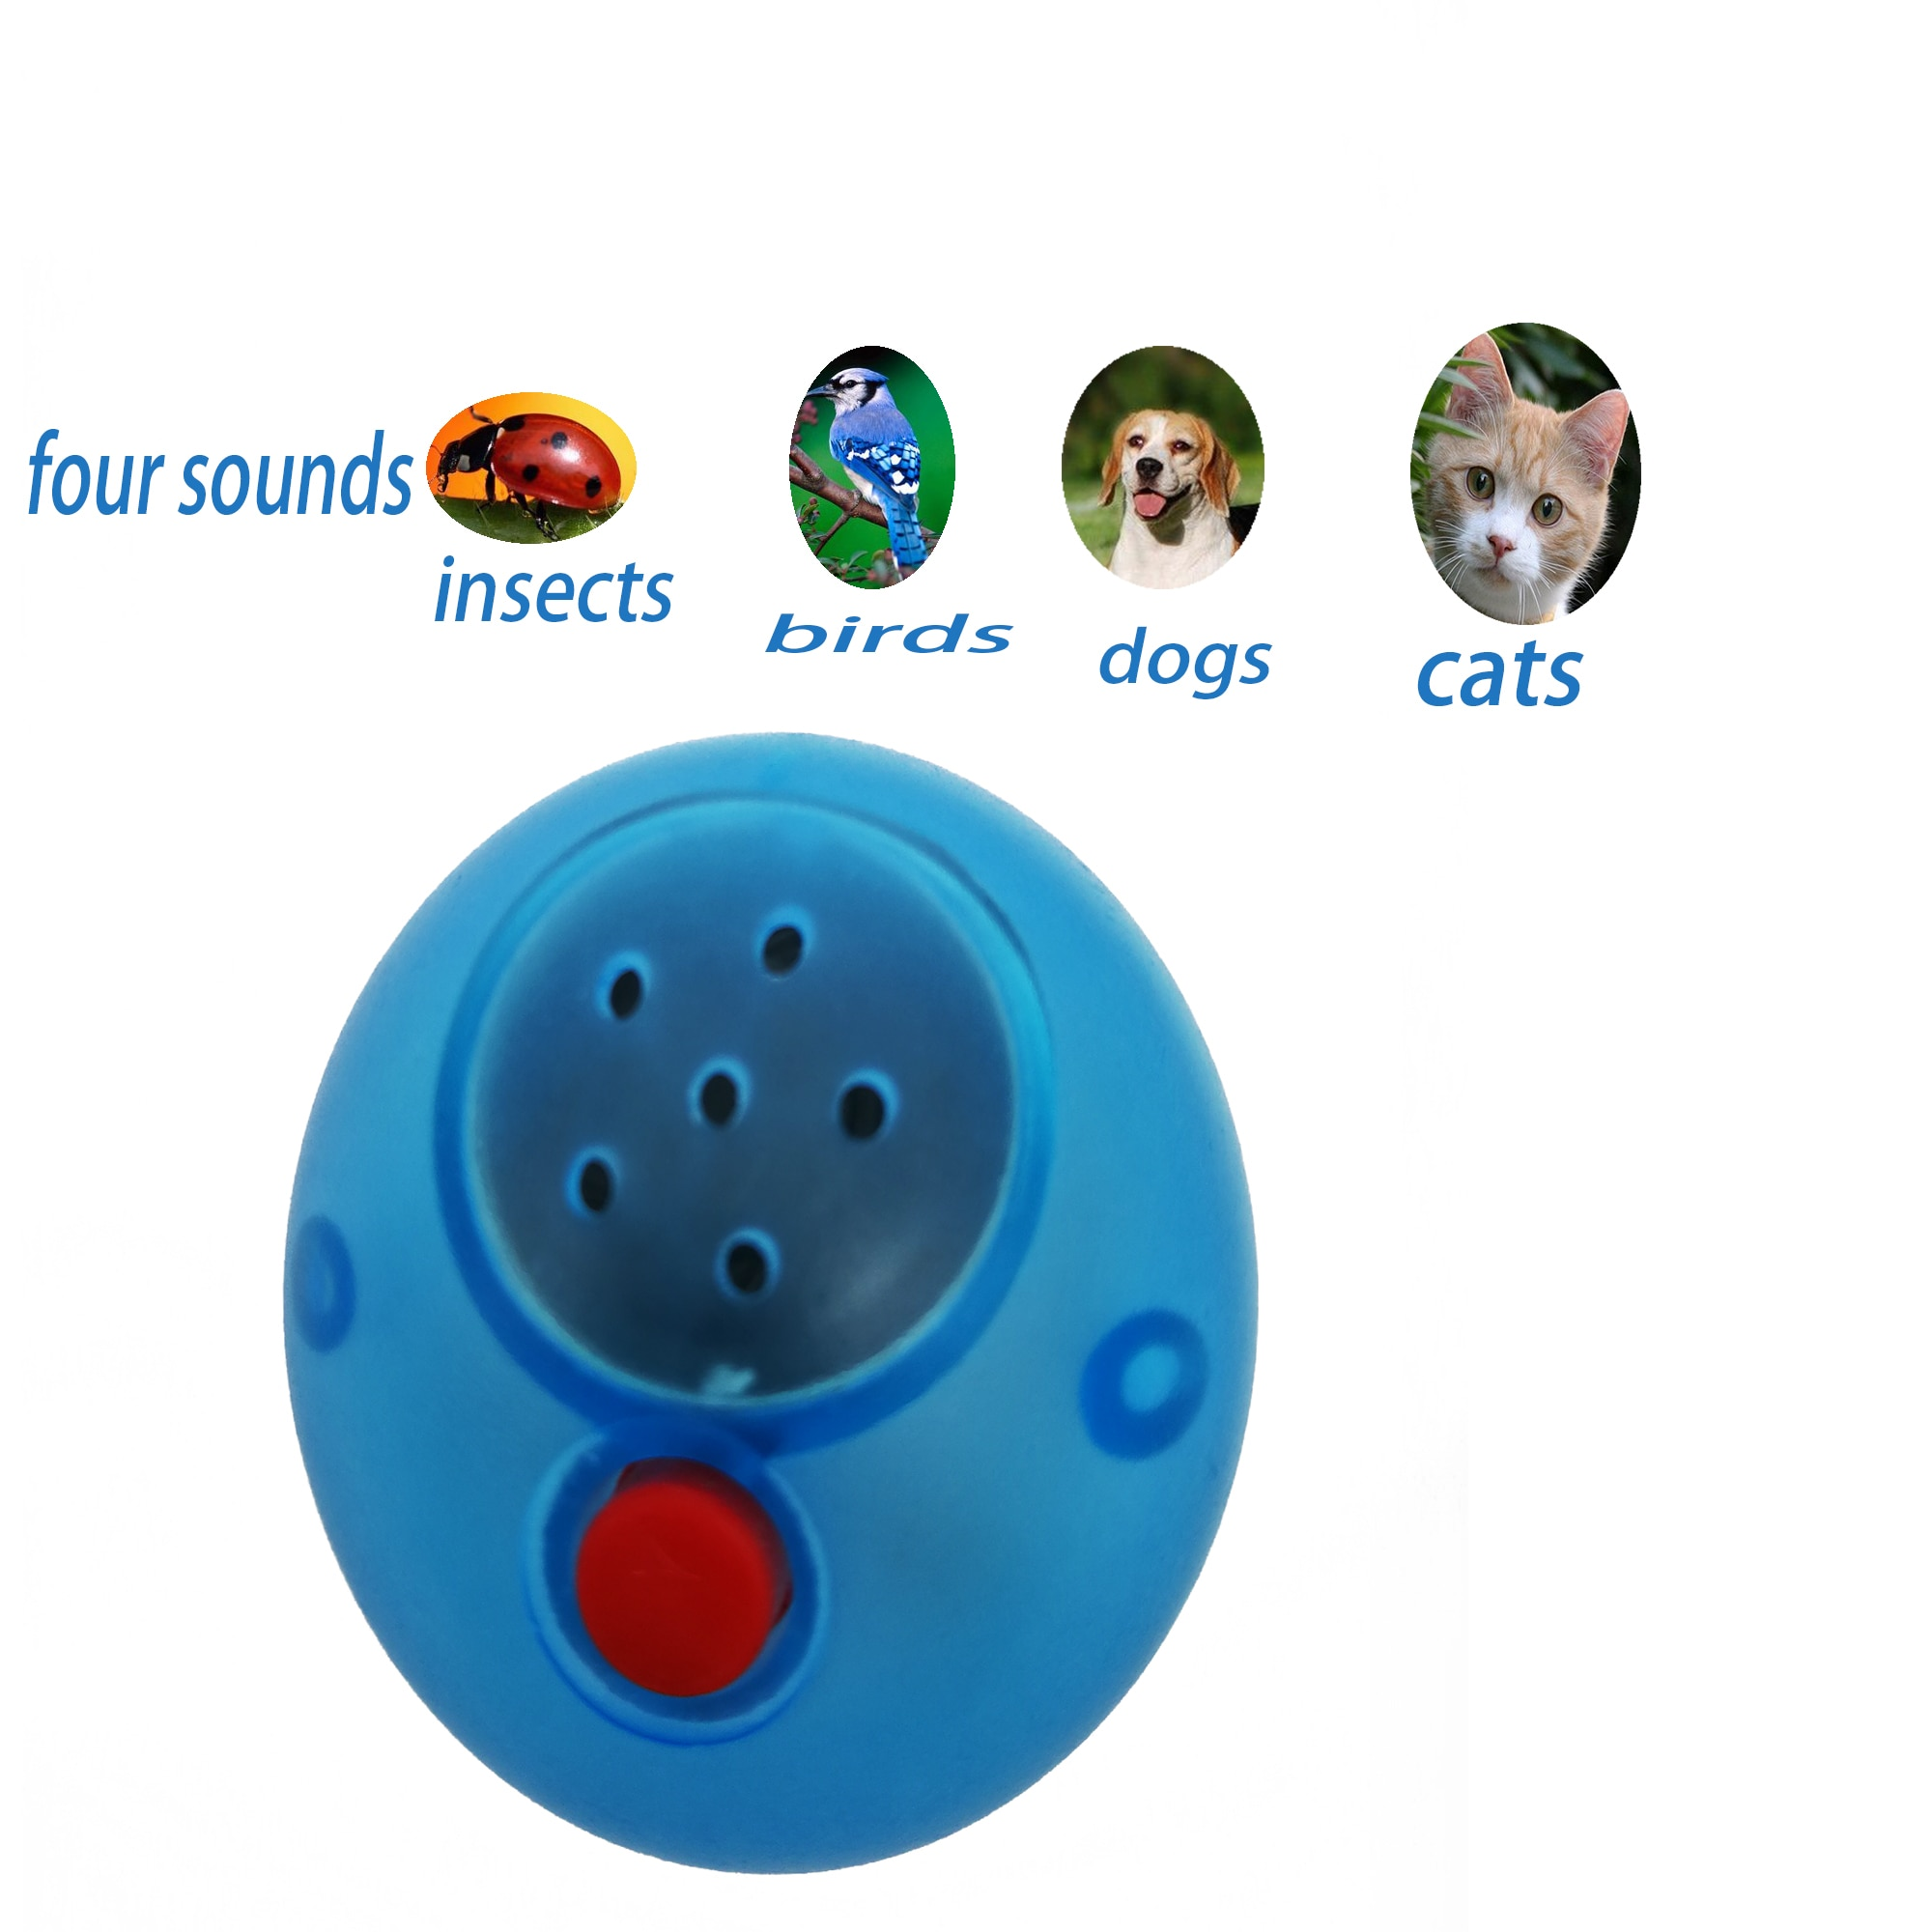 Bola de juguete de gato electrónico torre de pista divertido gato interactivo rascador Bola de empuje turbo juguete sonido y bola de luz juguete de gato